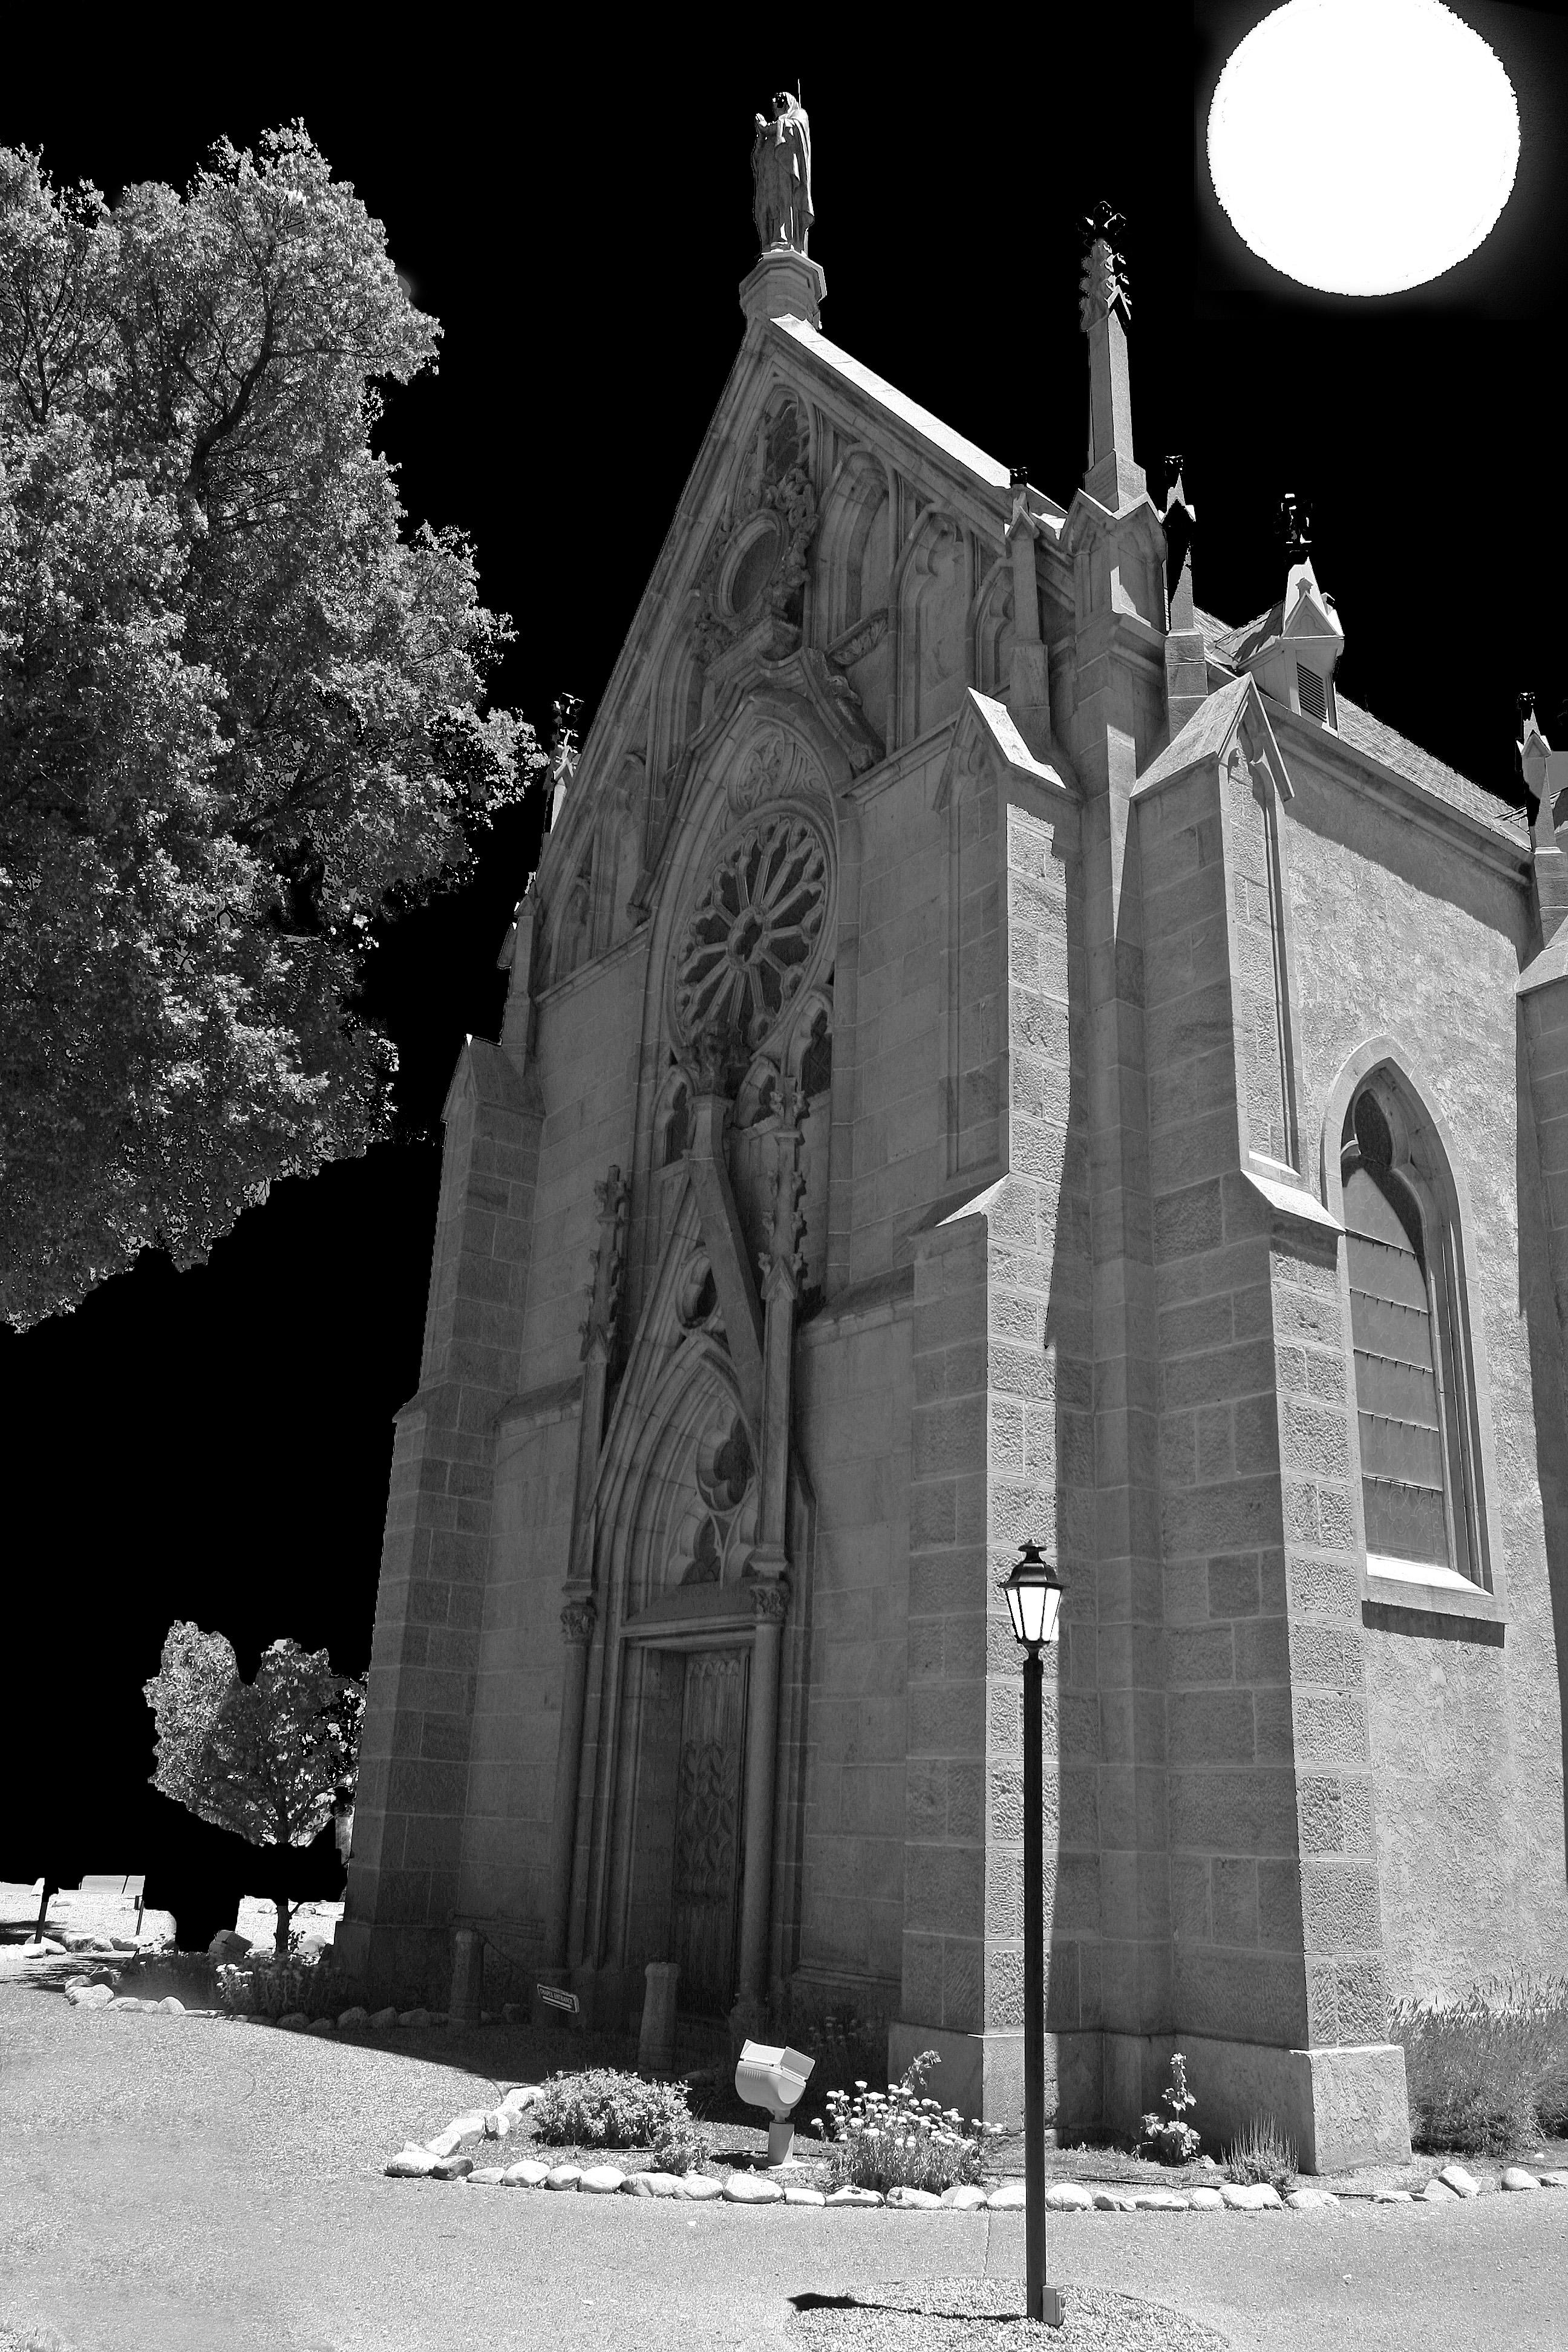 Scary_Church_at_Night_(7726430308)